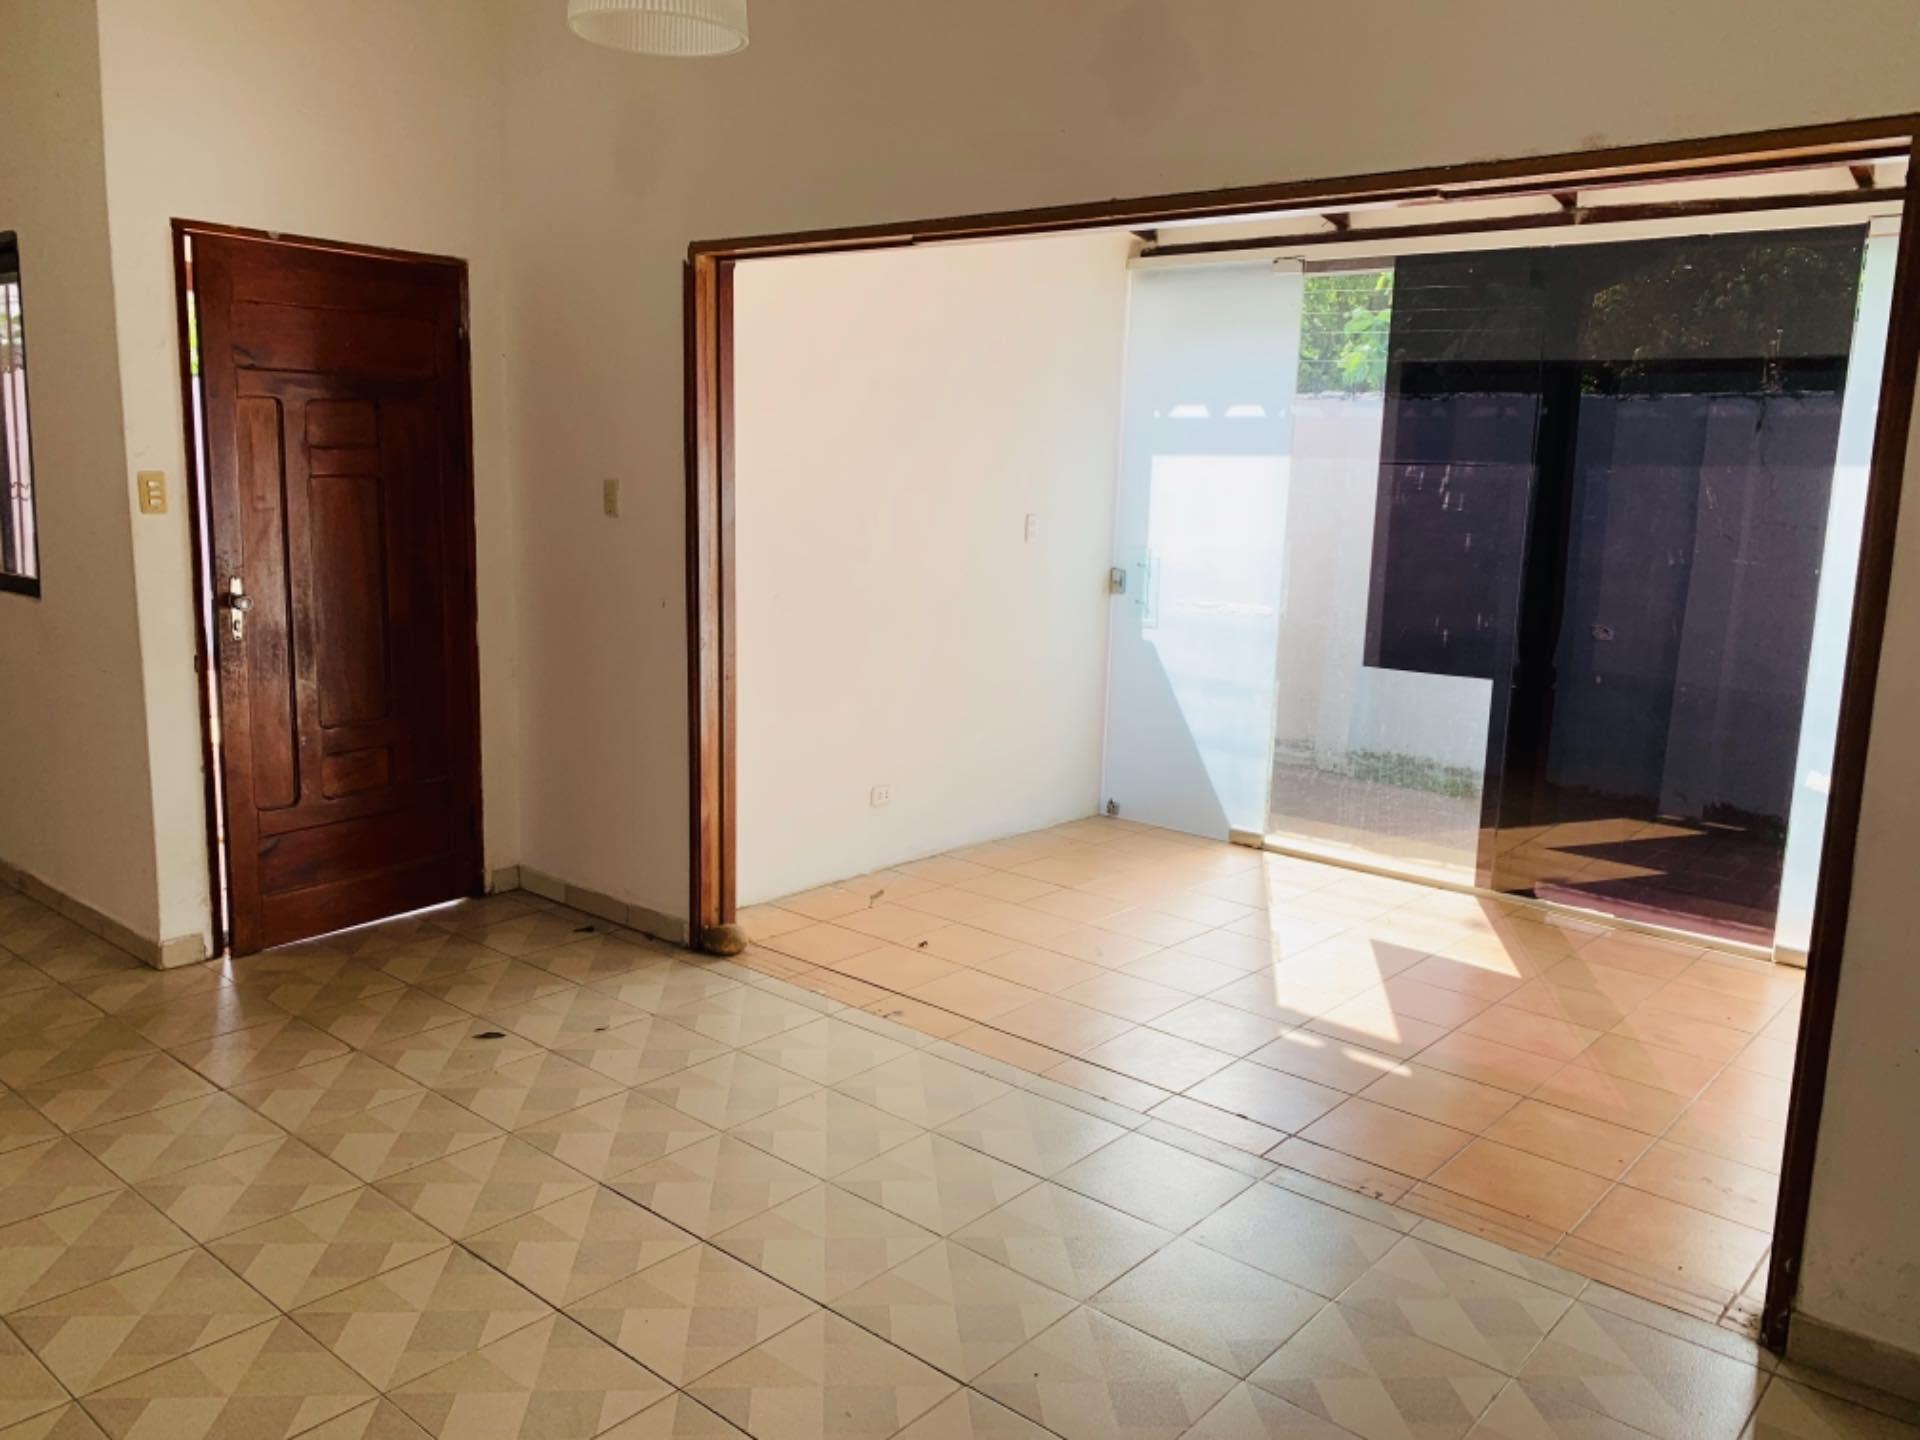 Casa en Alquiler Barrio Equipetrol entre 3er y 4to Anillo Foto 5